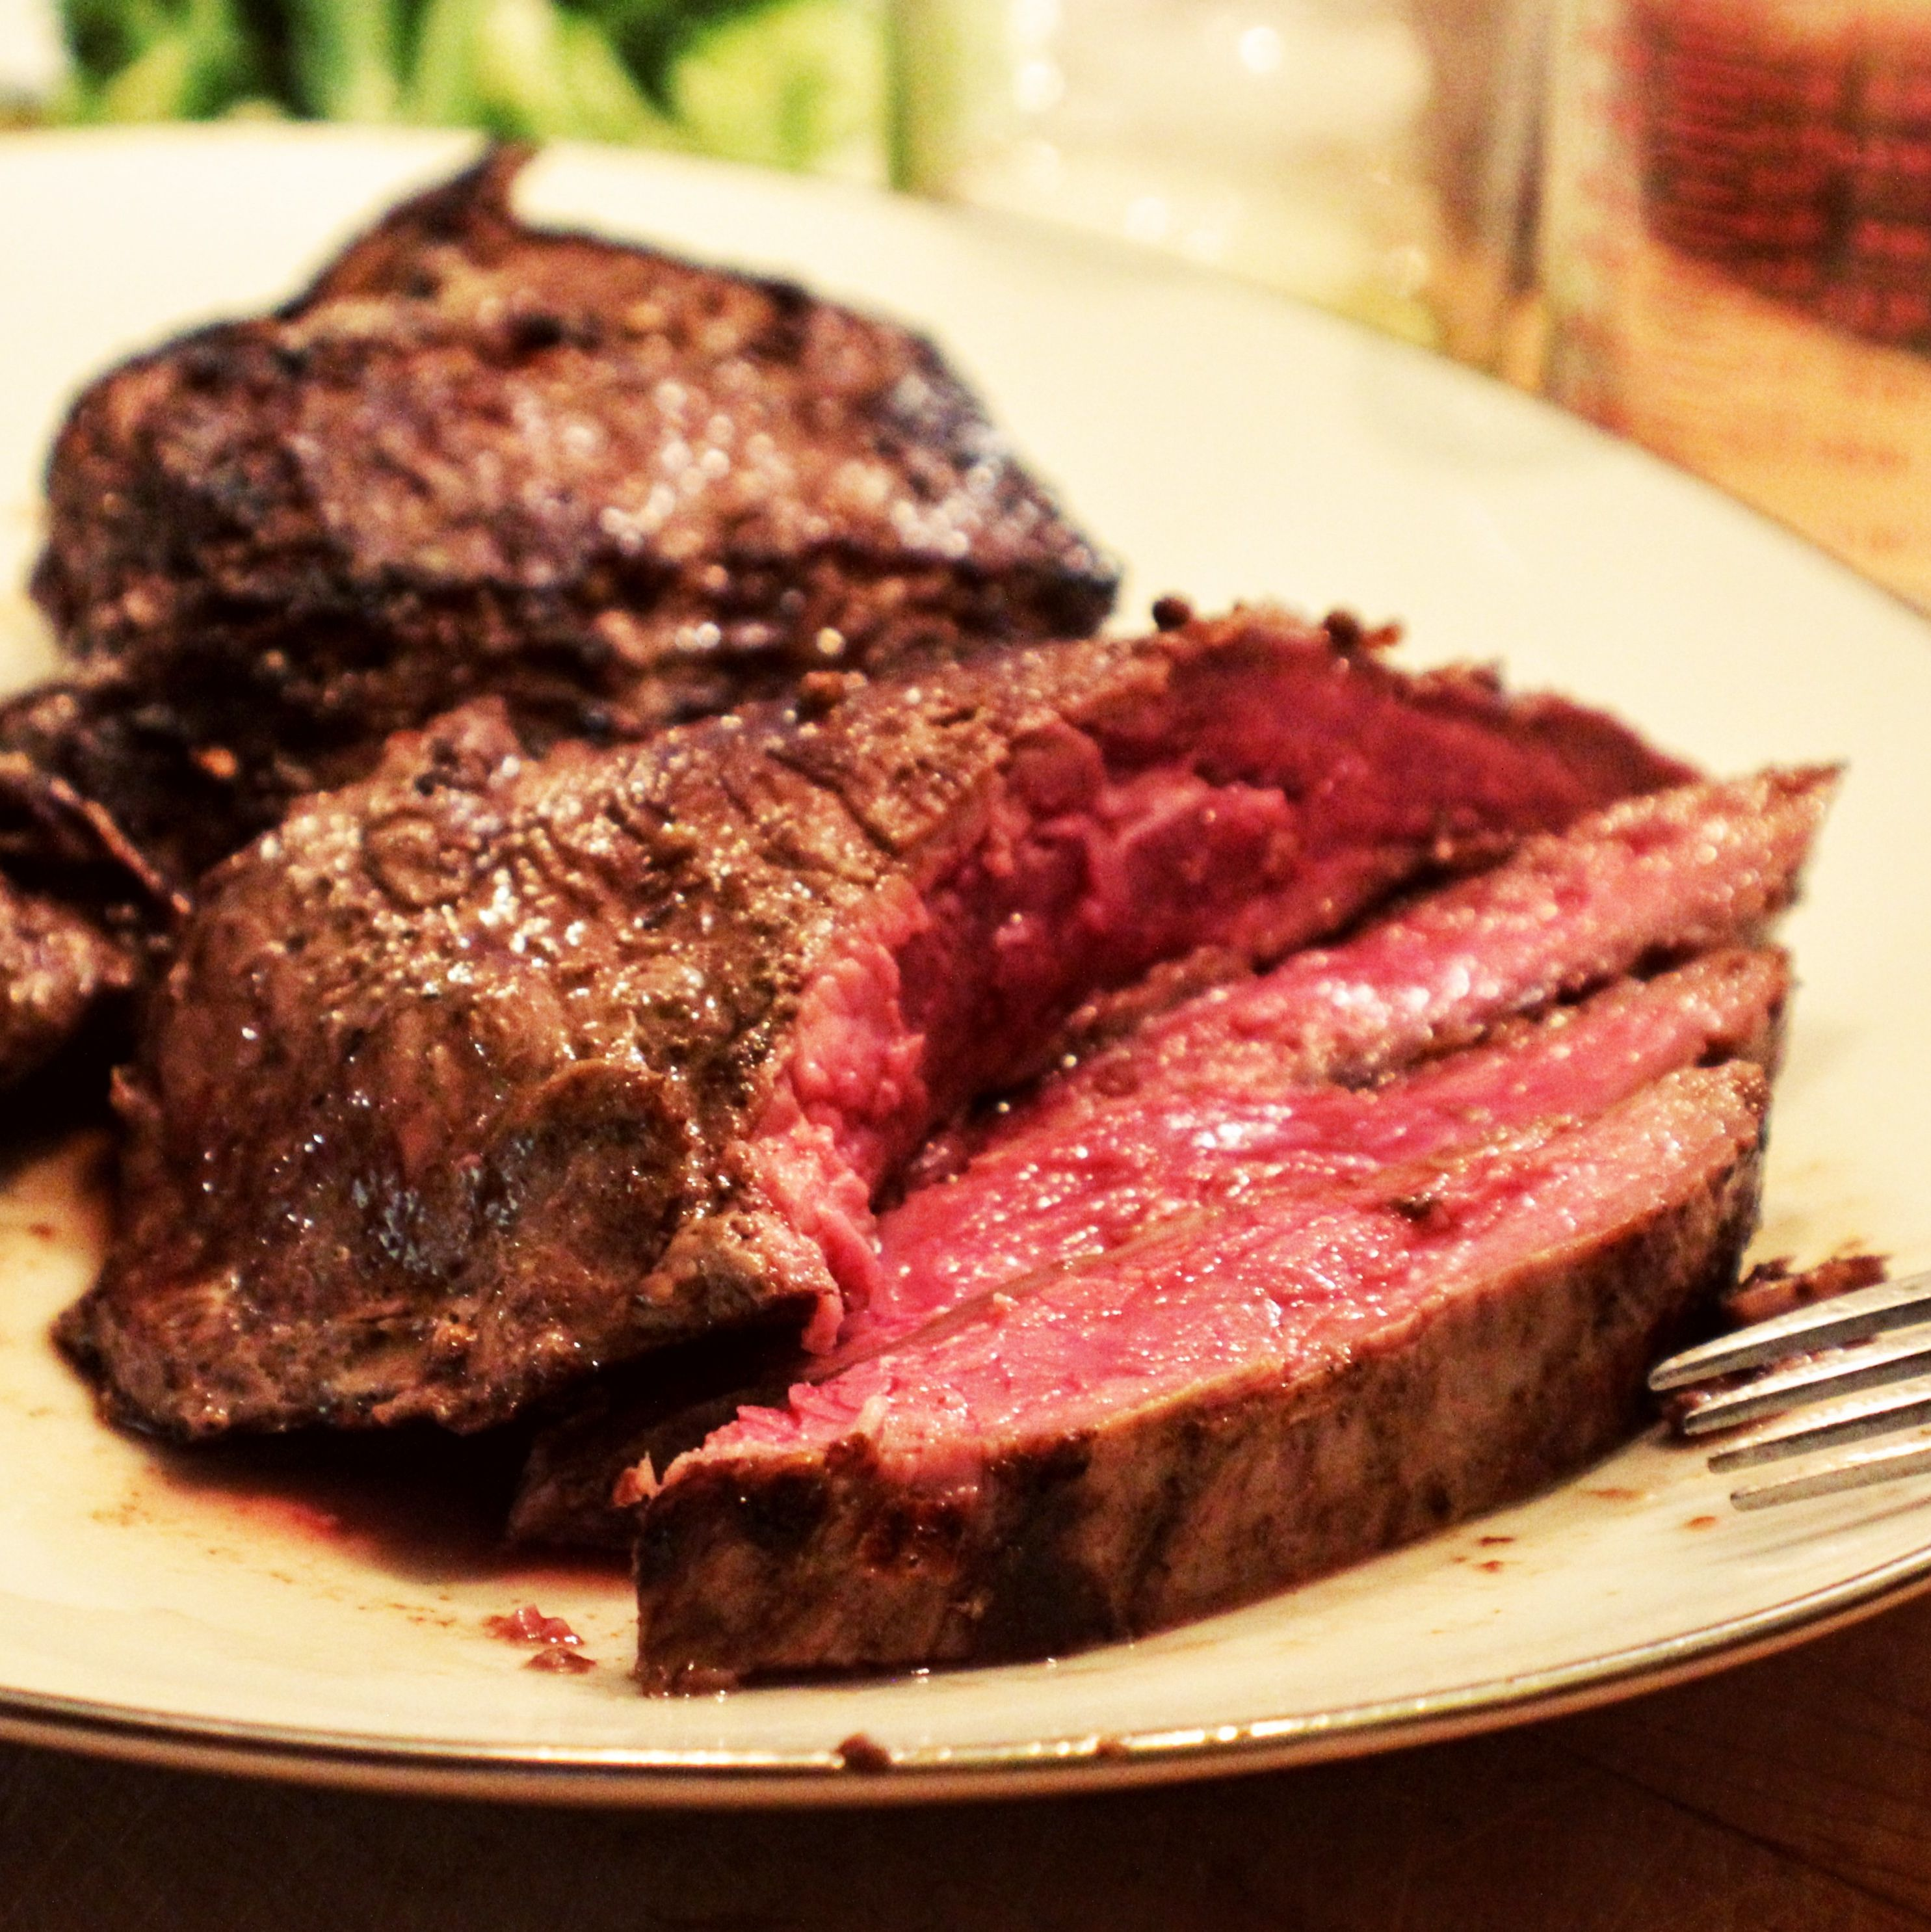 Sarasota beef company y8m2g7